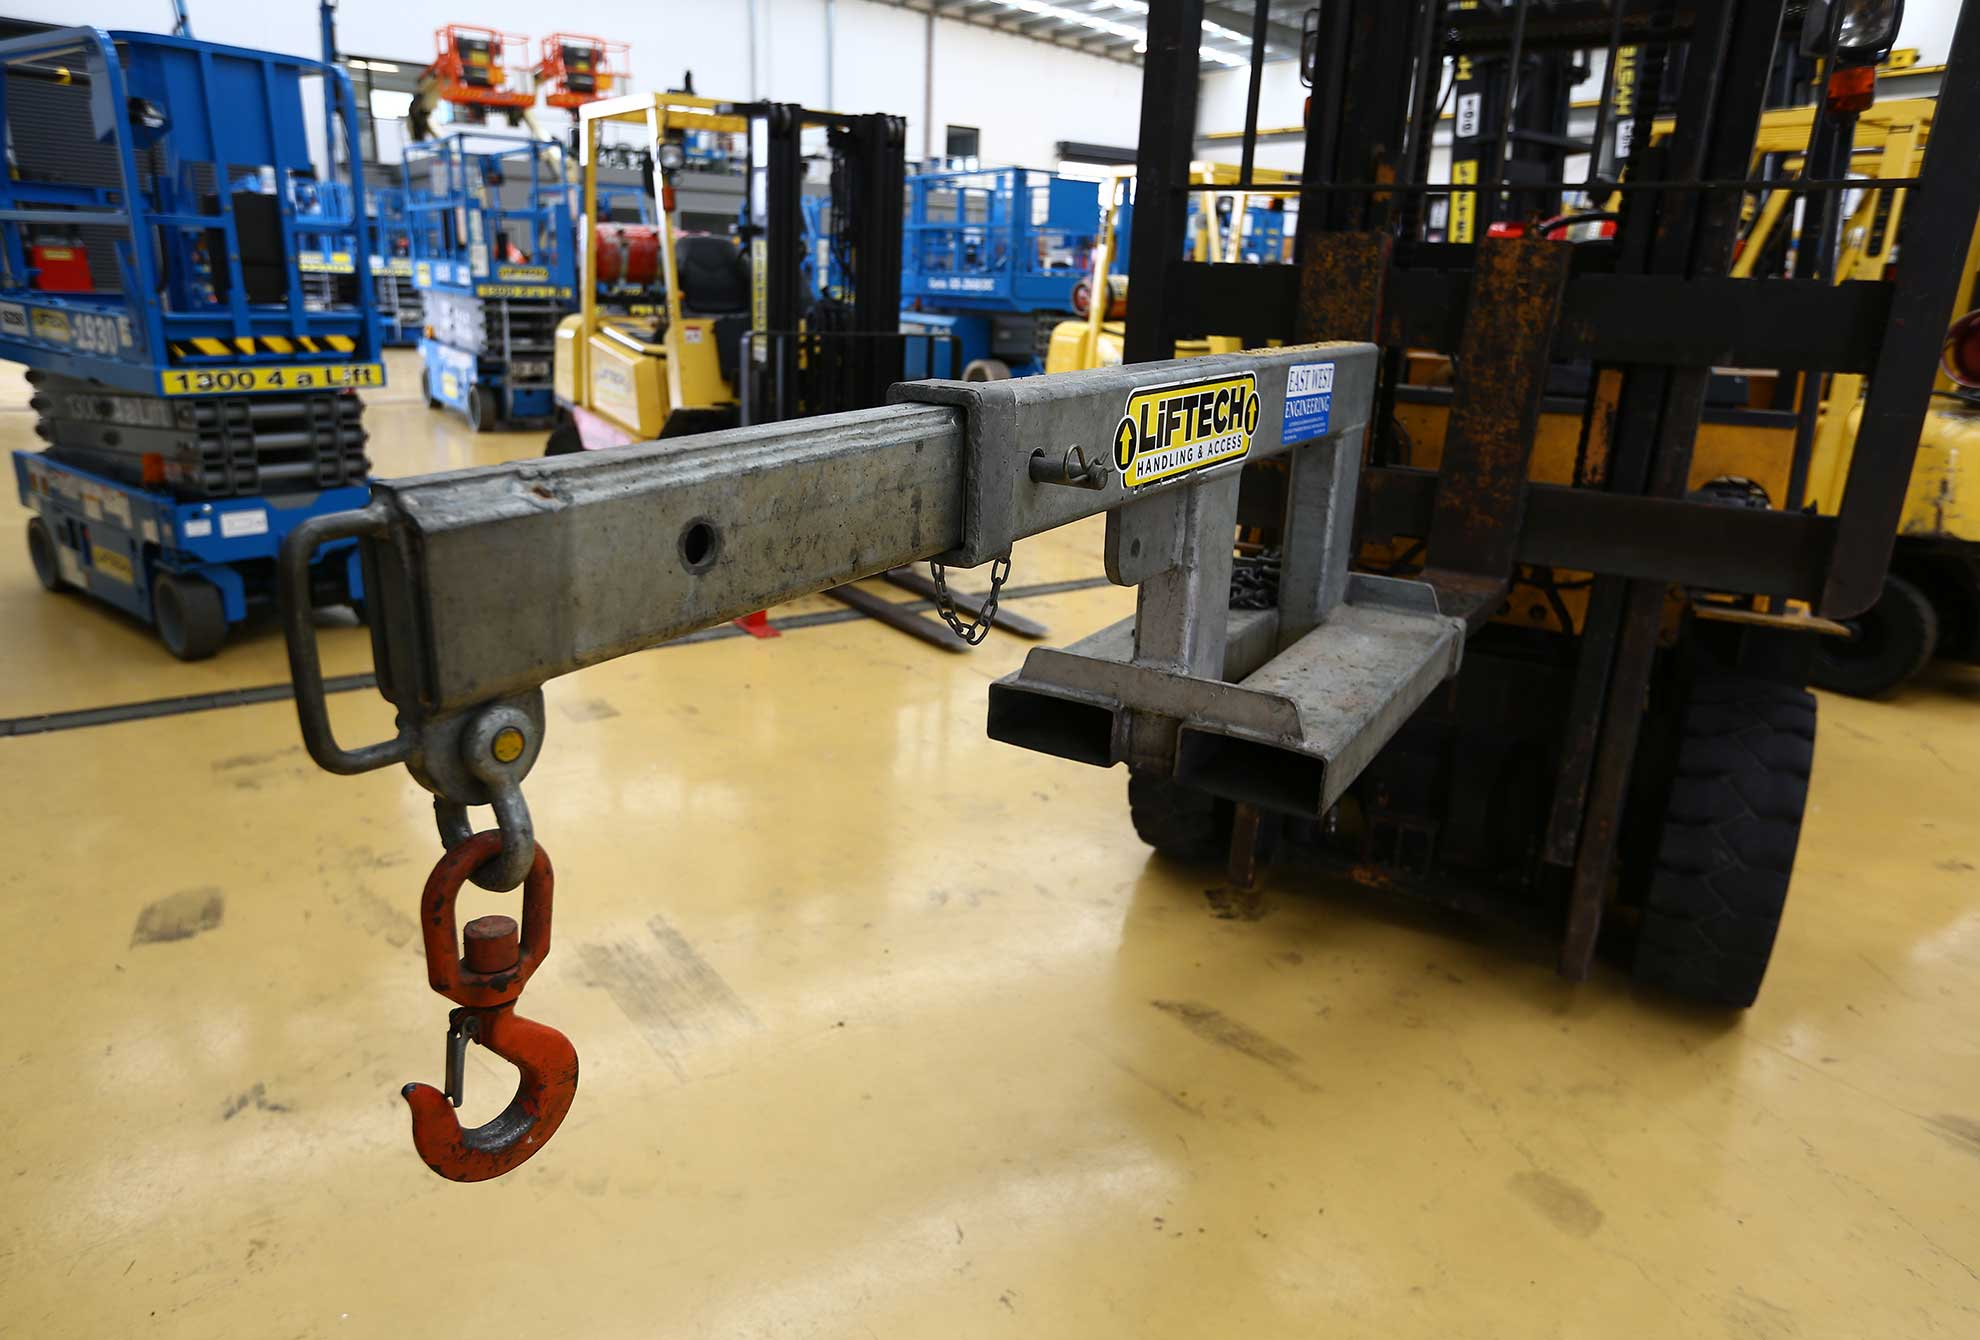 Crane jib 2.5 ton Forklift